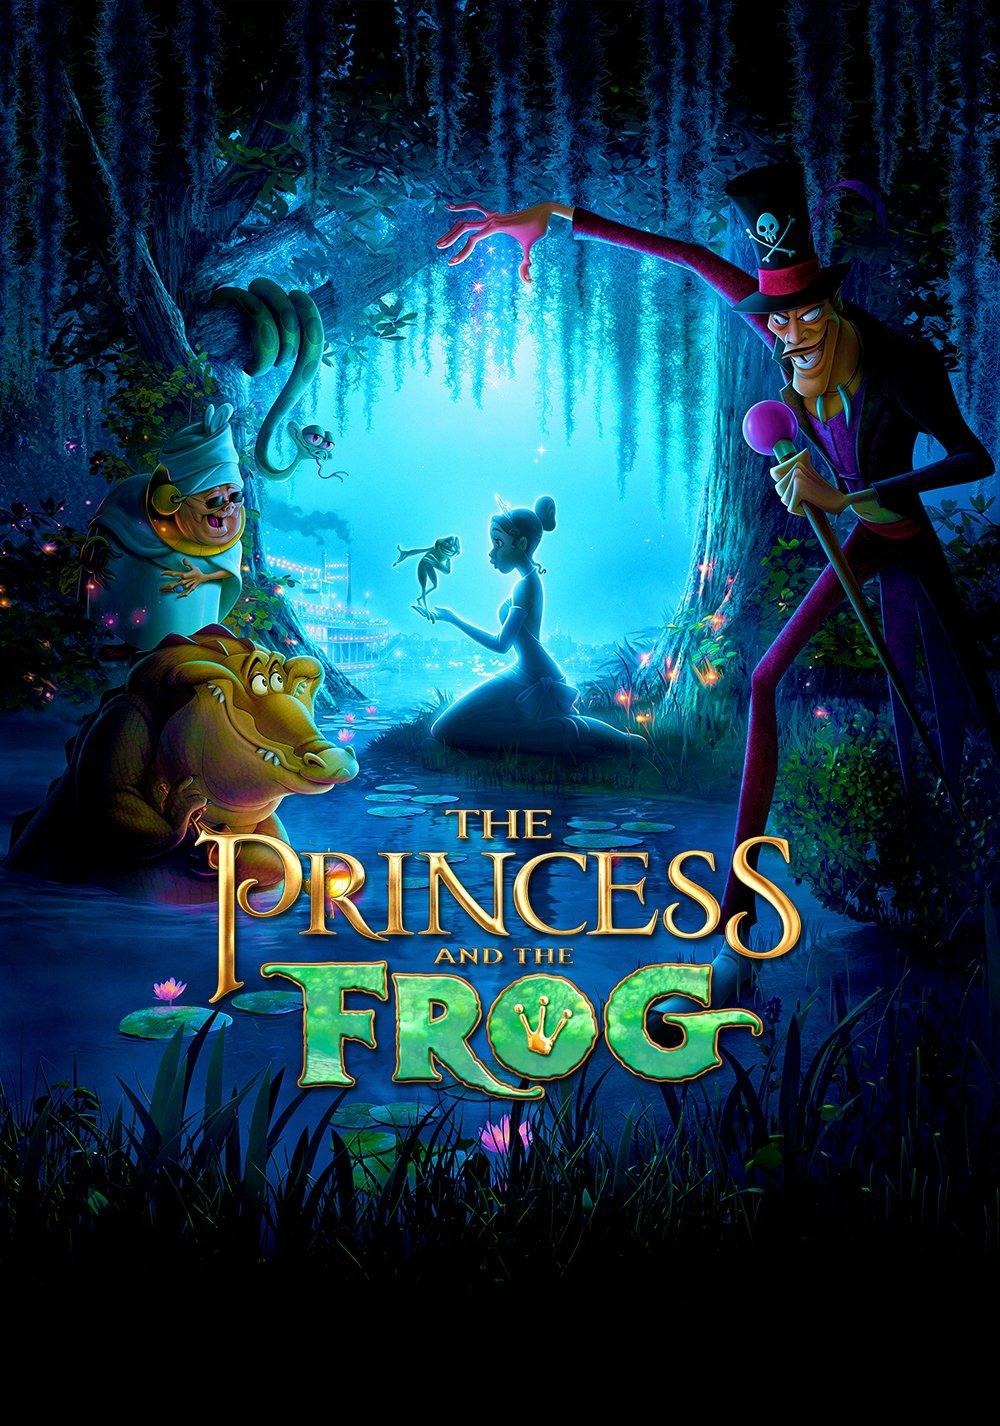 the-princess-and-the-frog-56bac03cdb24b.jpg